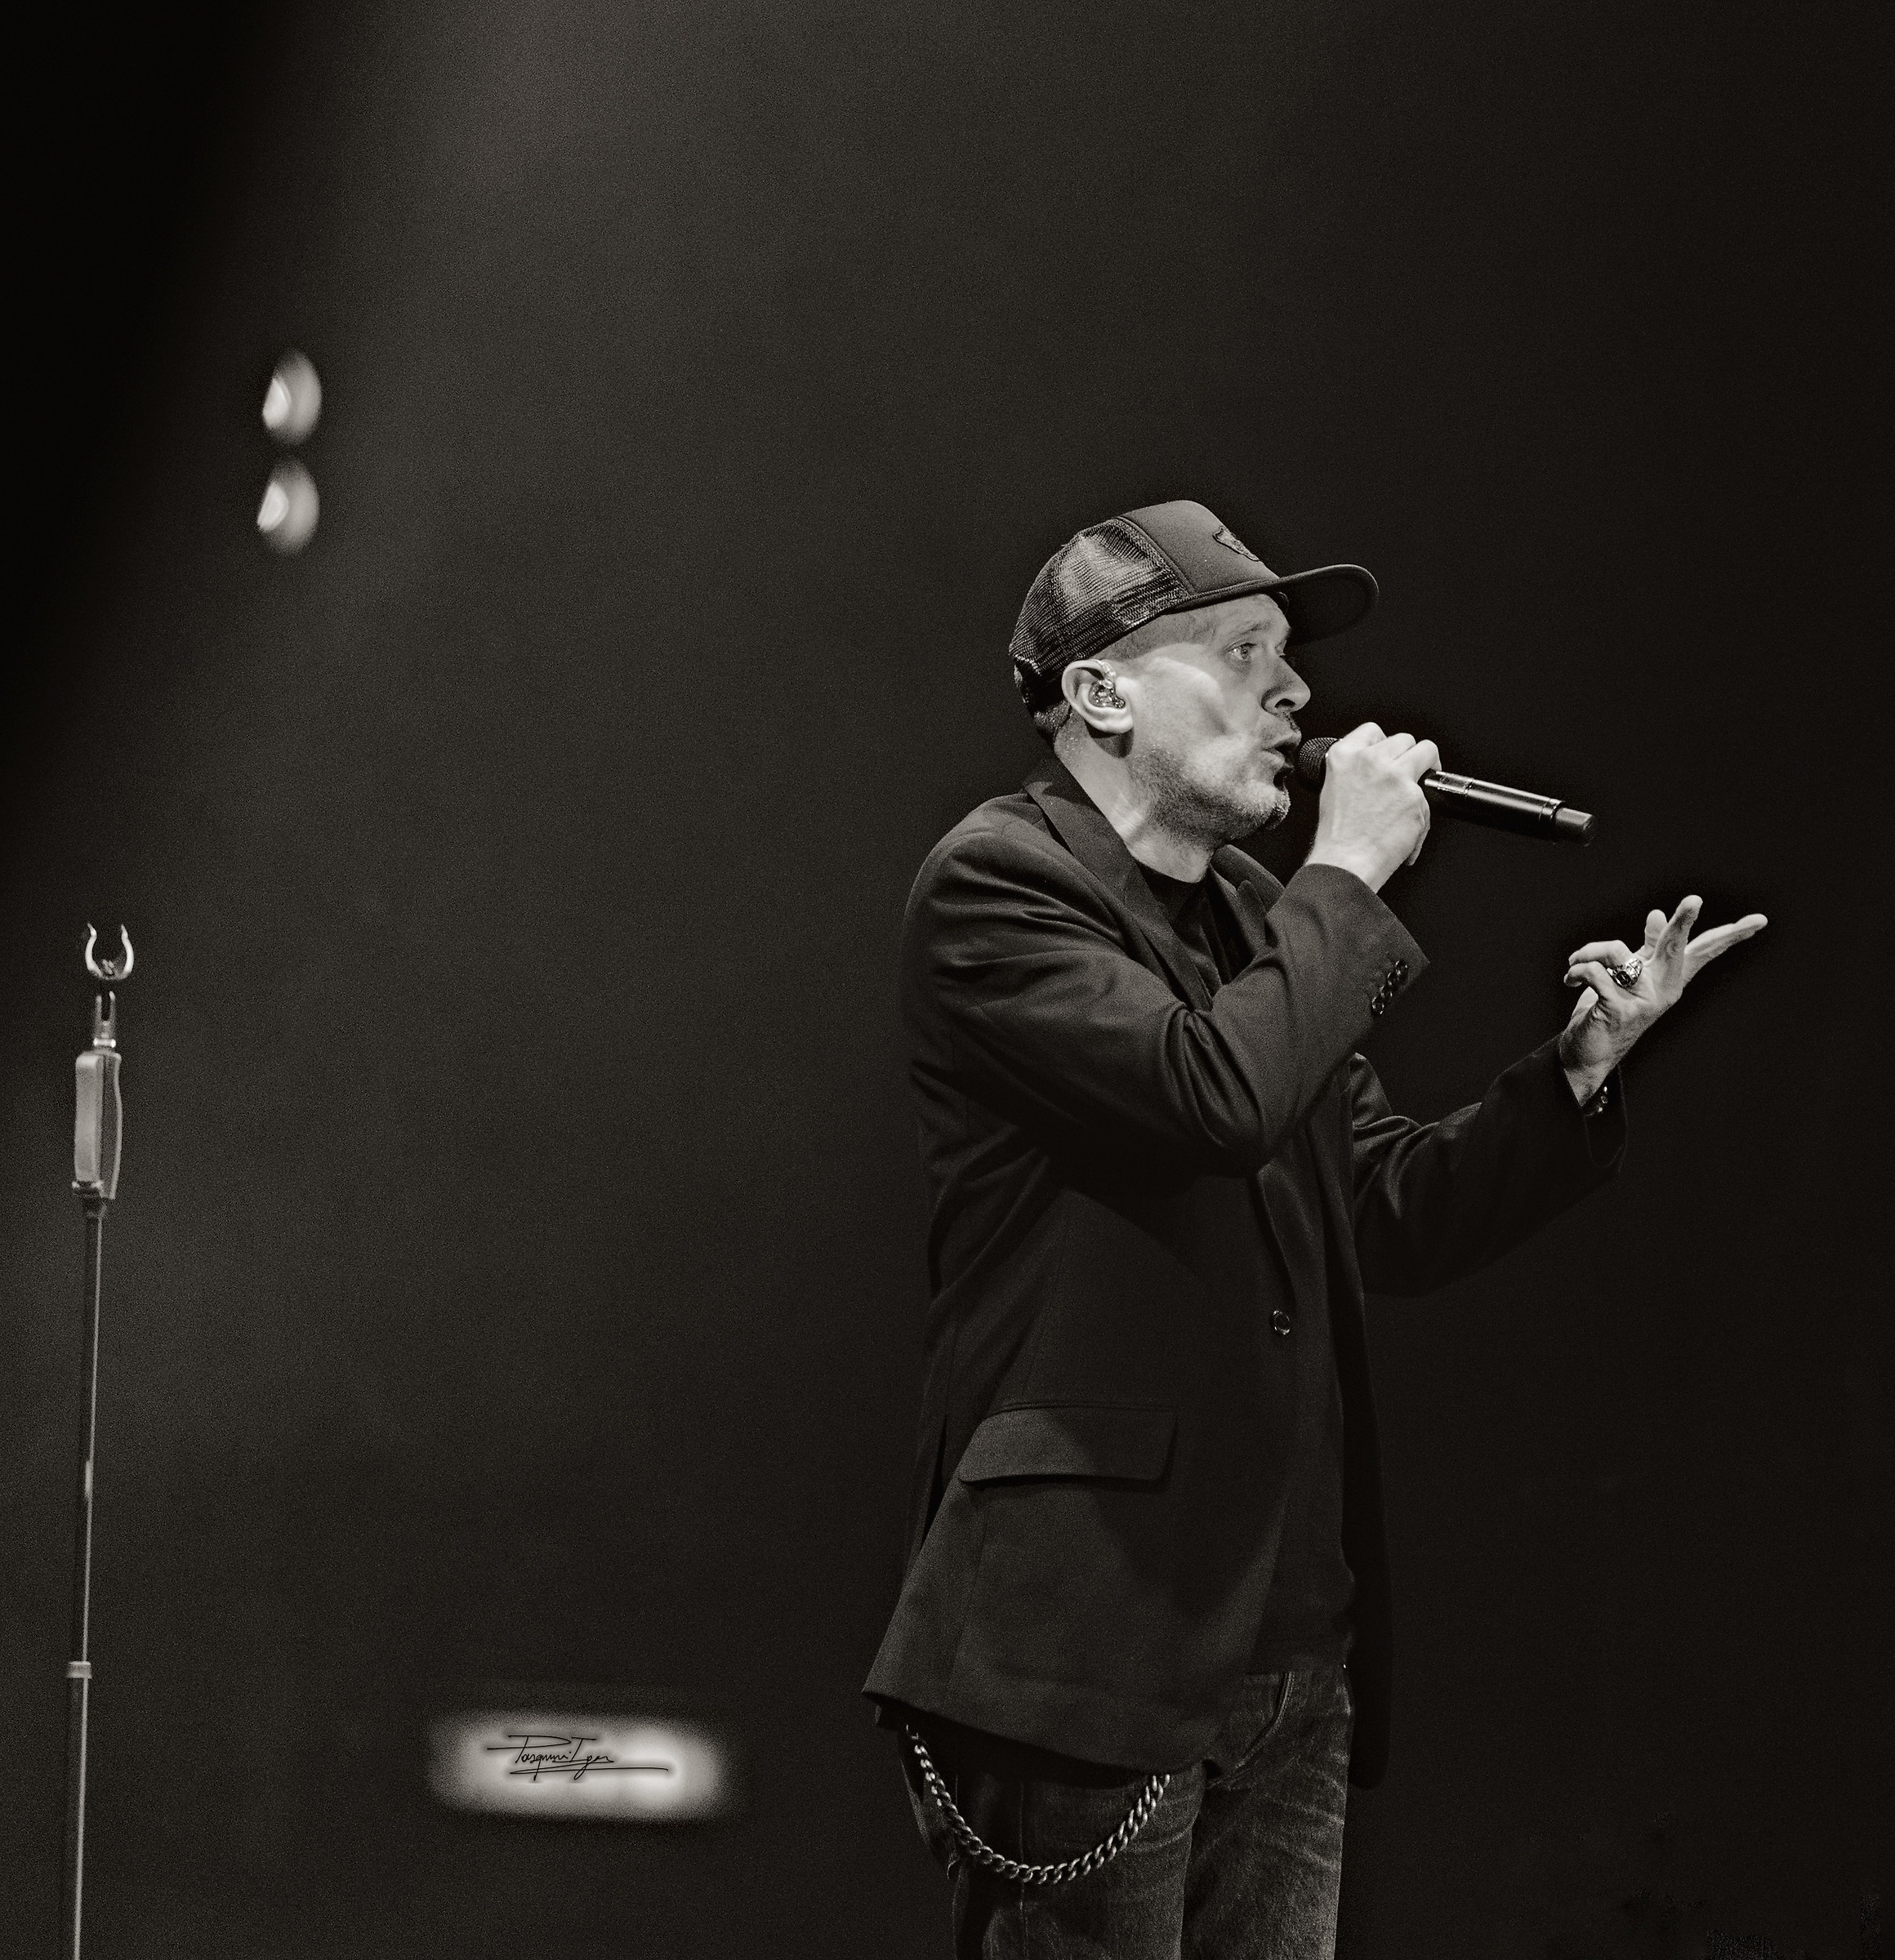 Max Pezzali tour 2015. Unipol Arena Bologna...